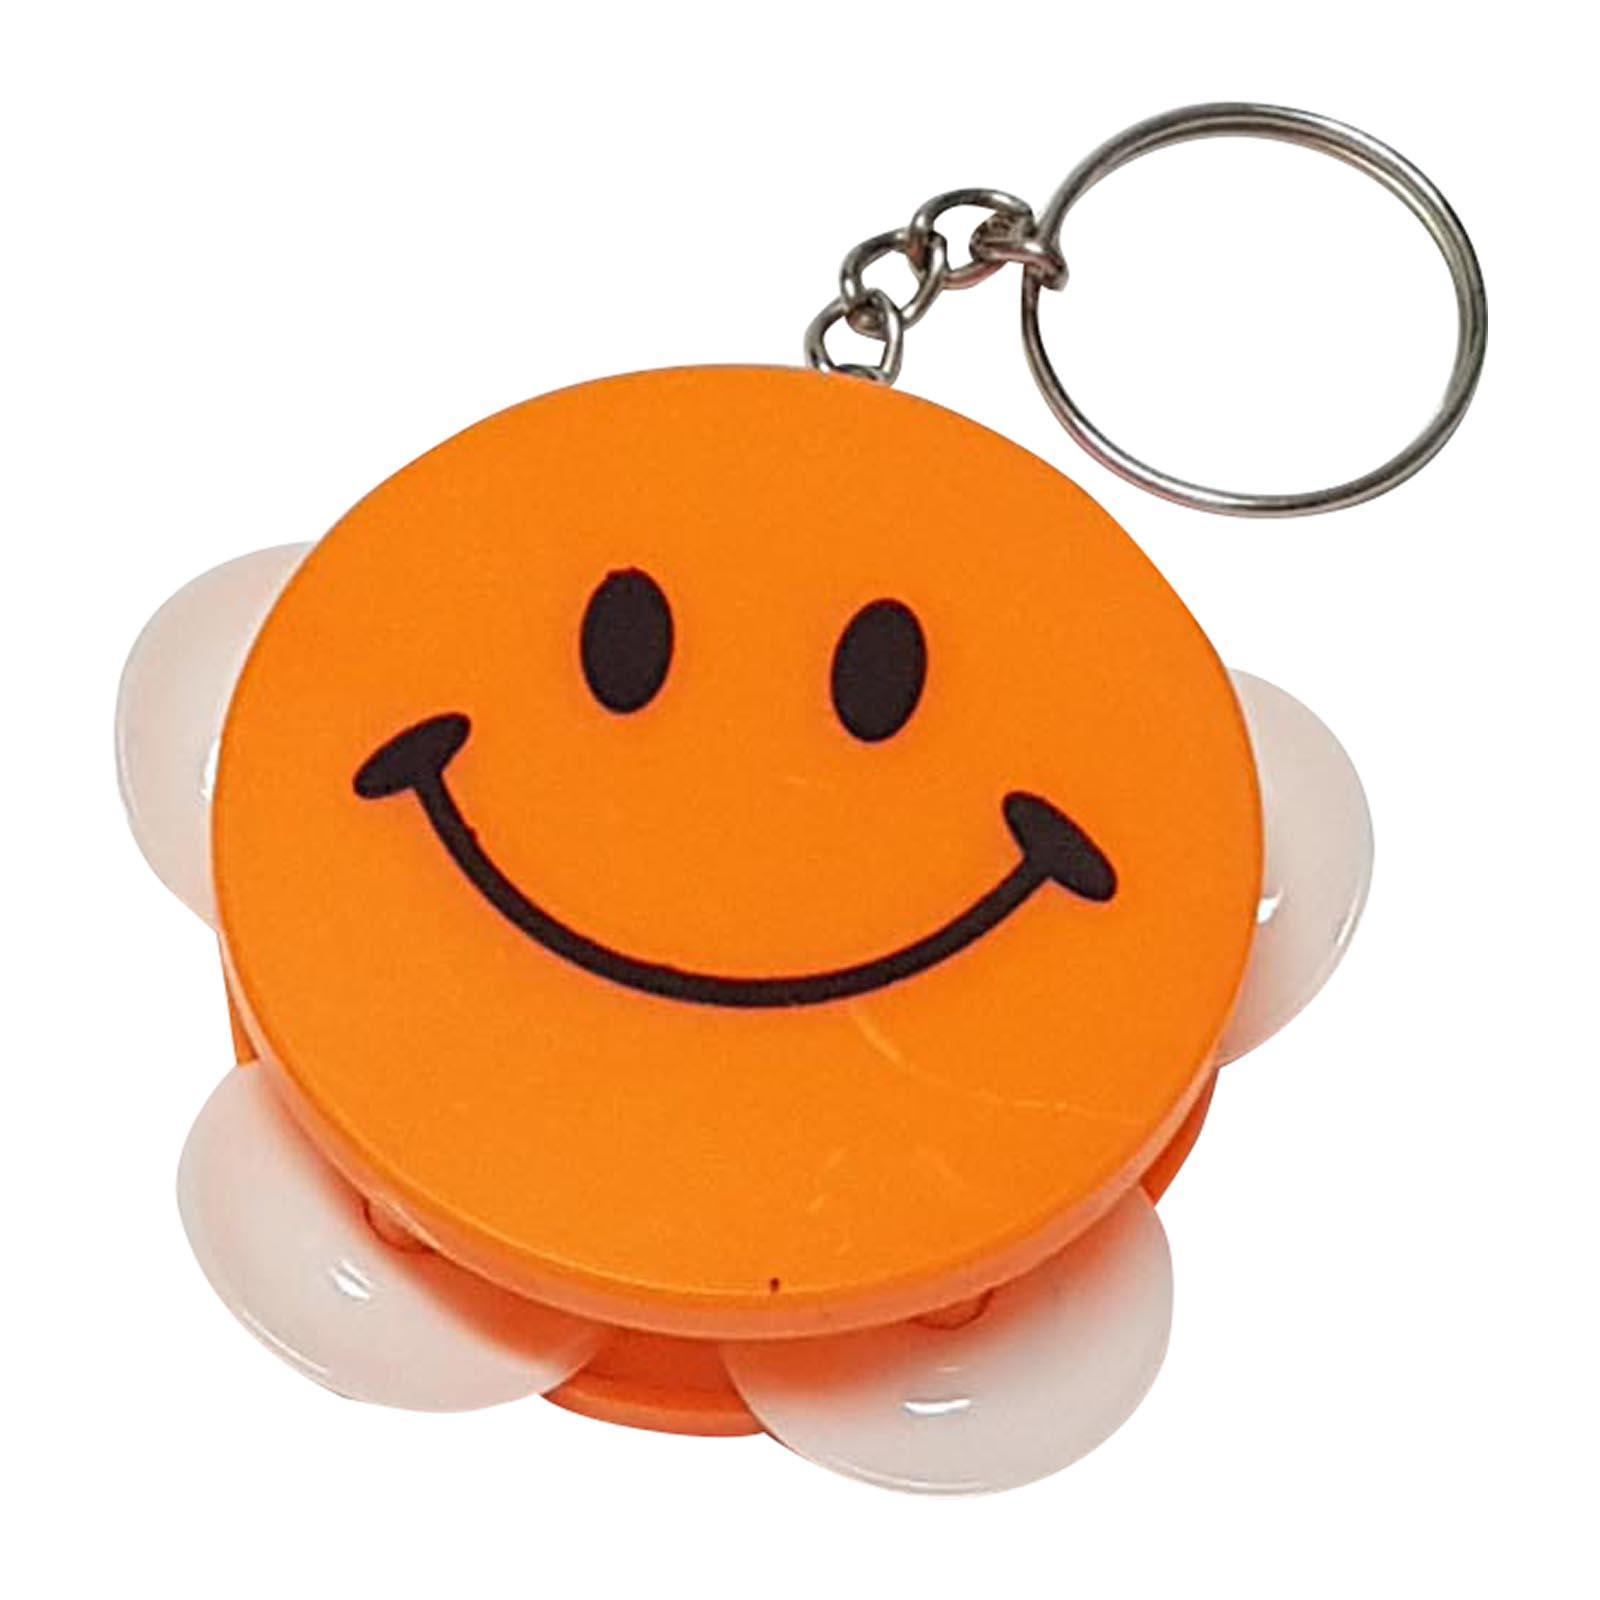 OEM 4.5 Cm Tambourine Keychain - Orange